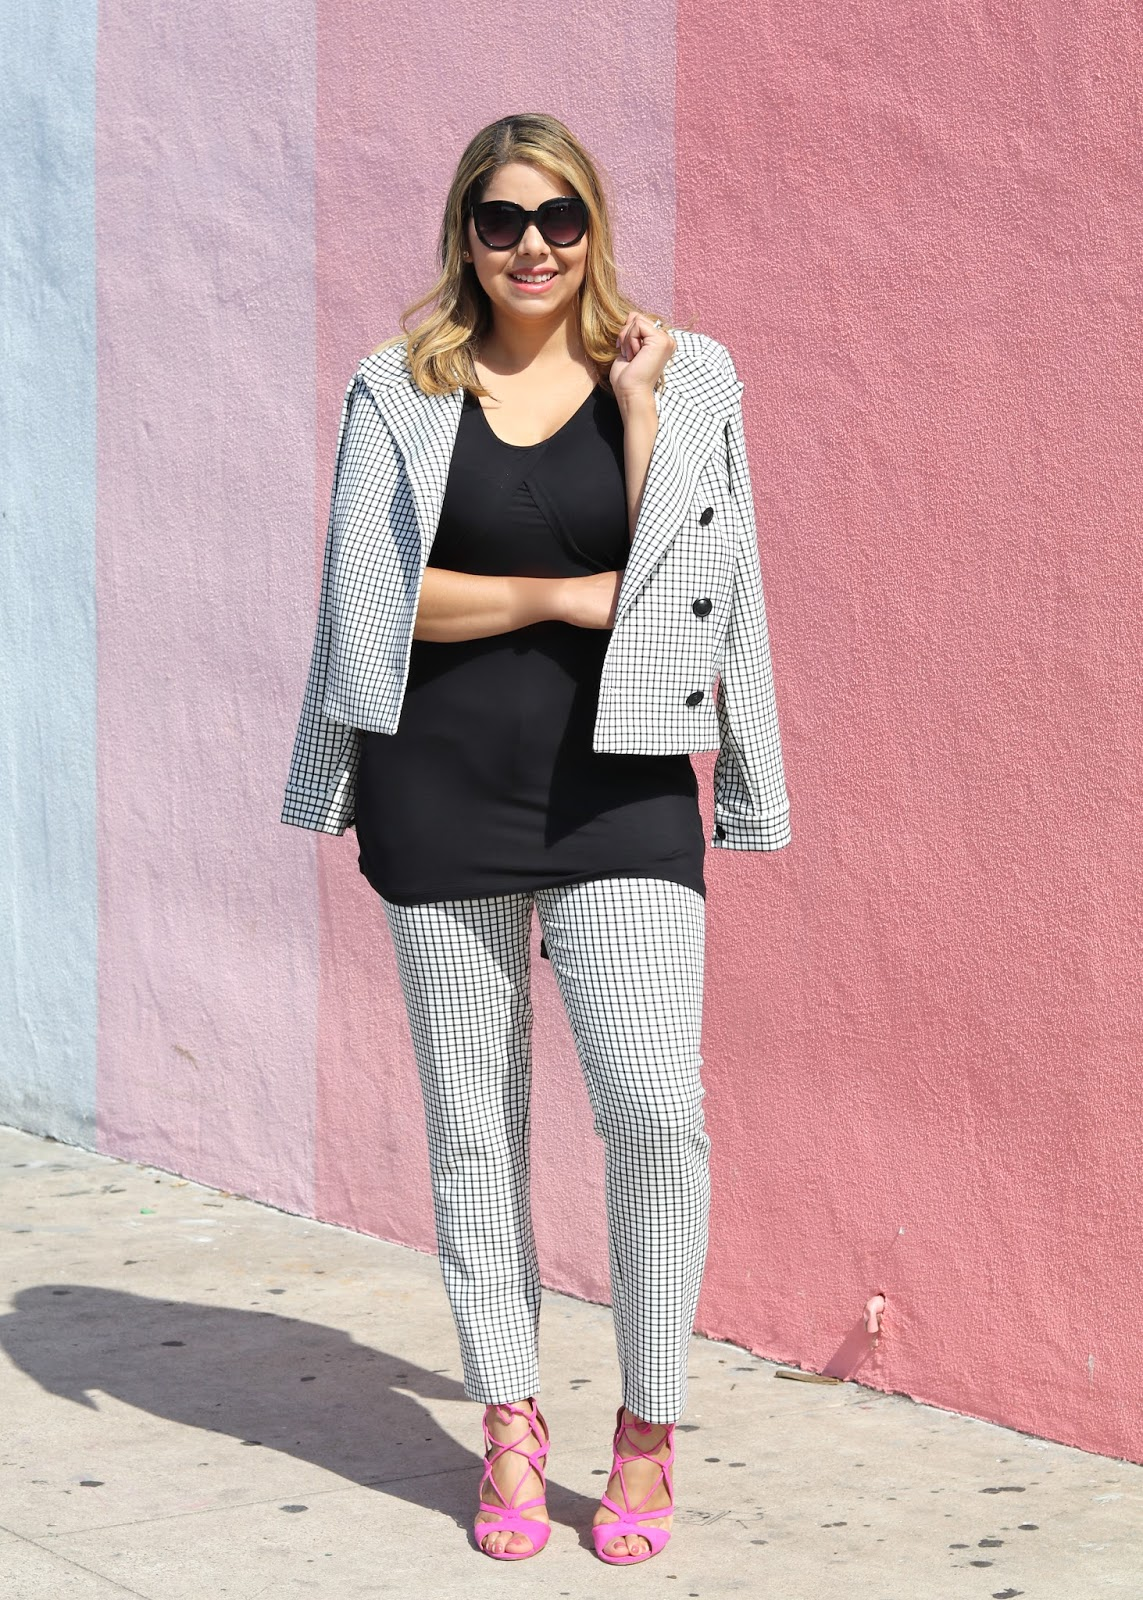 grid suit, women's windowpane suit, women's black and white grid suit, socal fashion blogger, fashionable suit for women